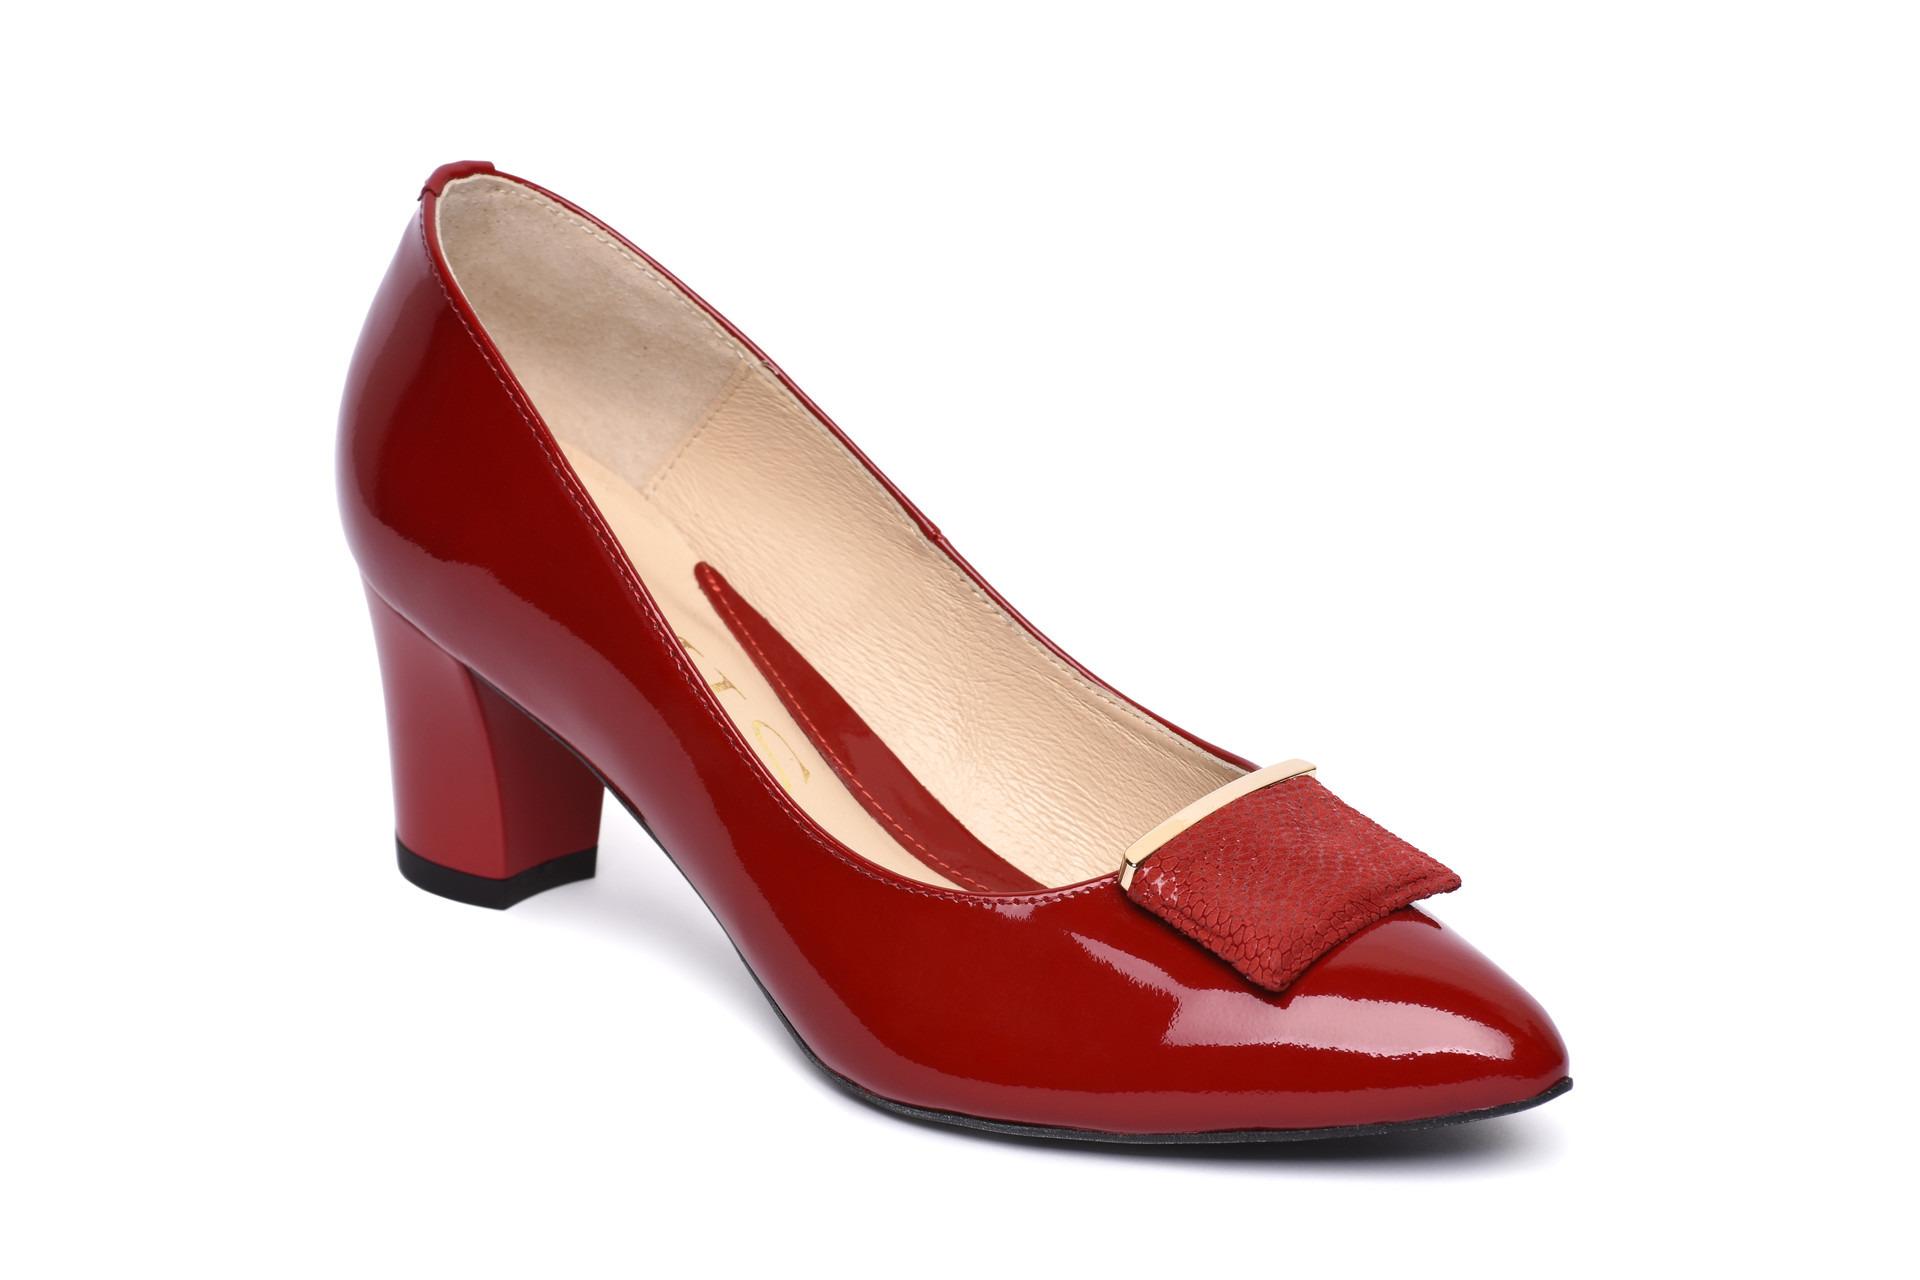 1e383b95b502 GALLERY SHOES - Lodičky - Lodičky červené lakové s elegantnou ...